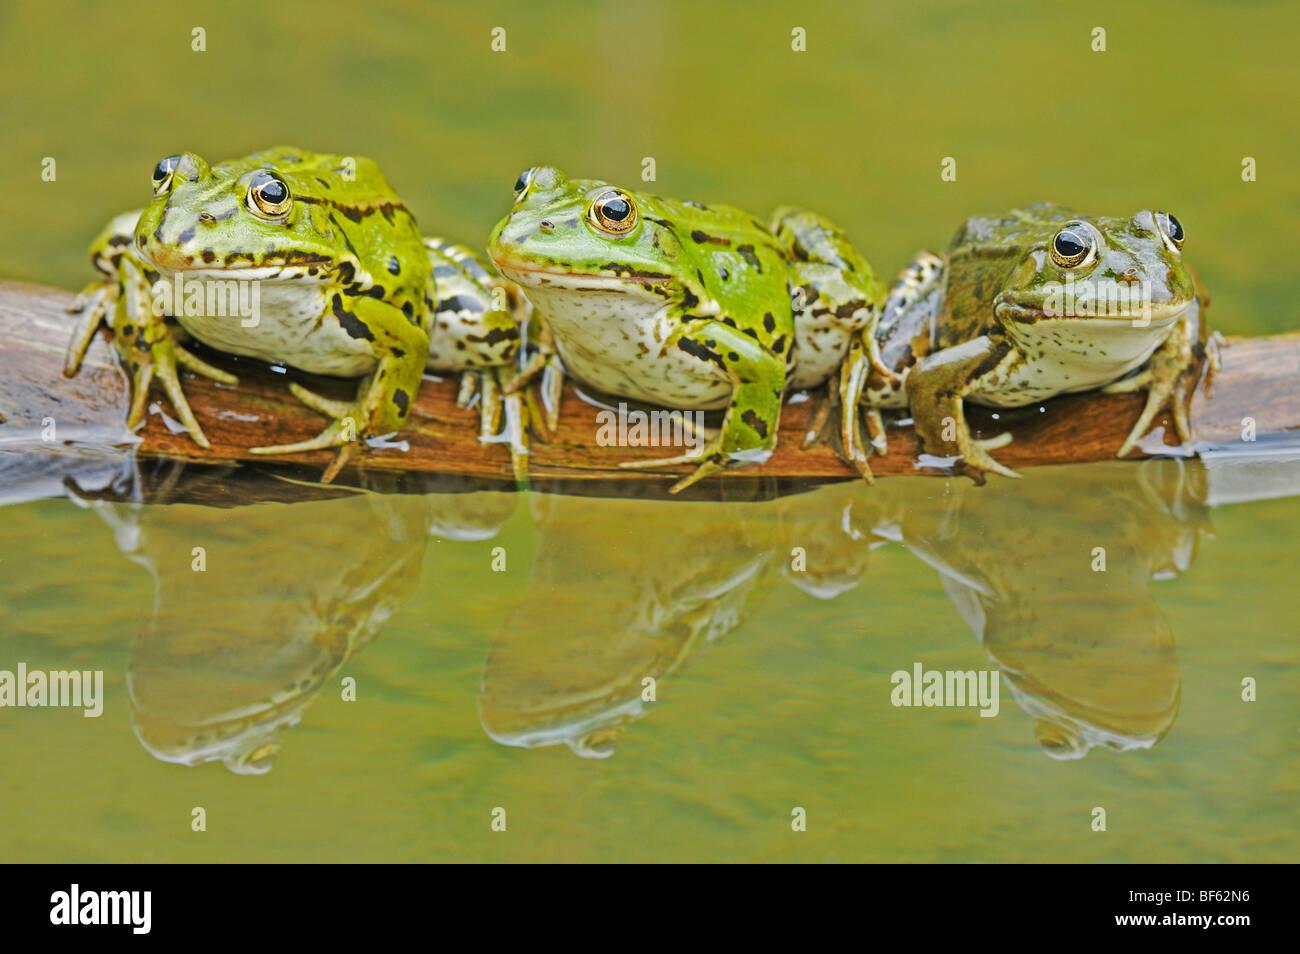 Edible Frog (Rana esculenta), adults on log, Switzerland, Europe - Stock Image